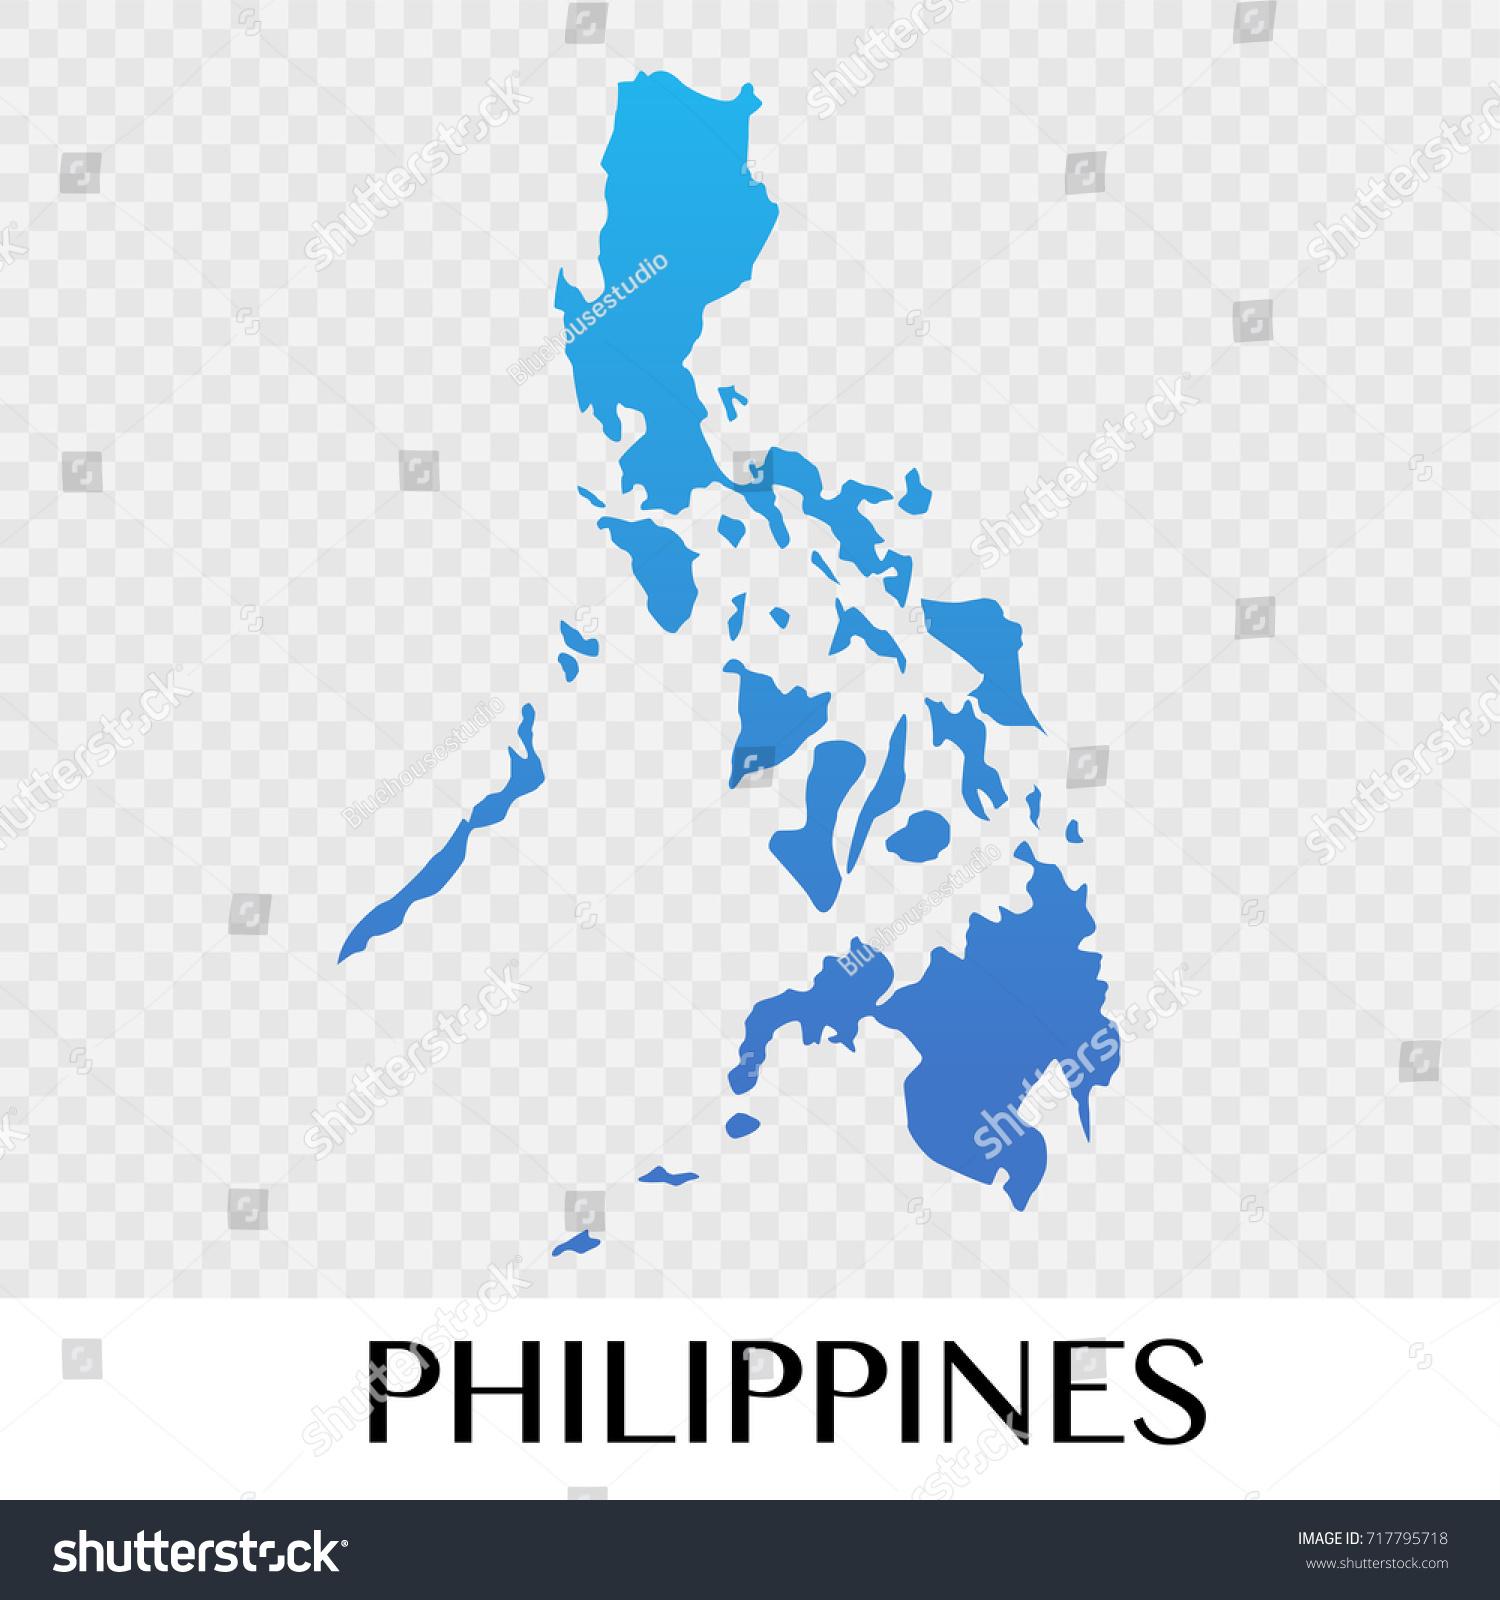 Picture of: Vector De Stock Libre De Regalias Sobre Philippines Map Asia Continent Illustration Design717795718